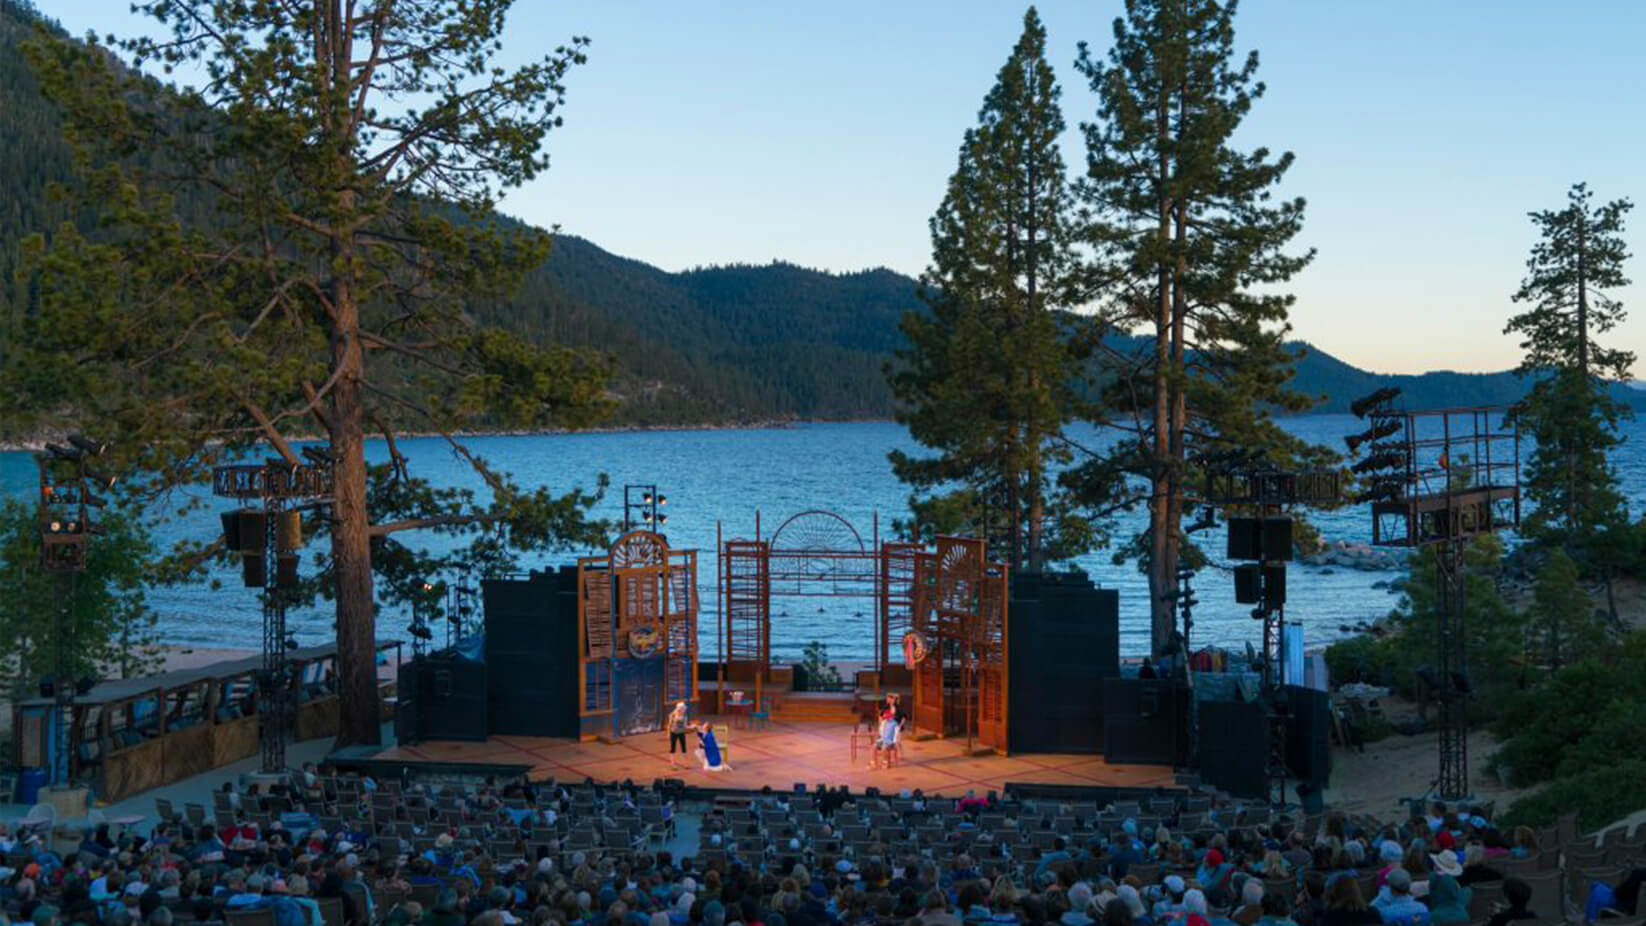 Lake Tahoe Shakespeare Festival Scenic Venue